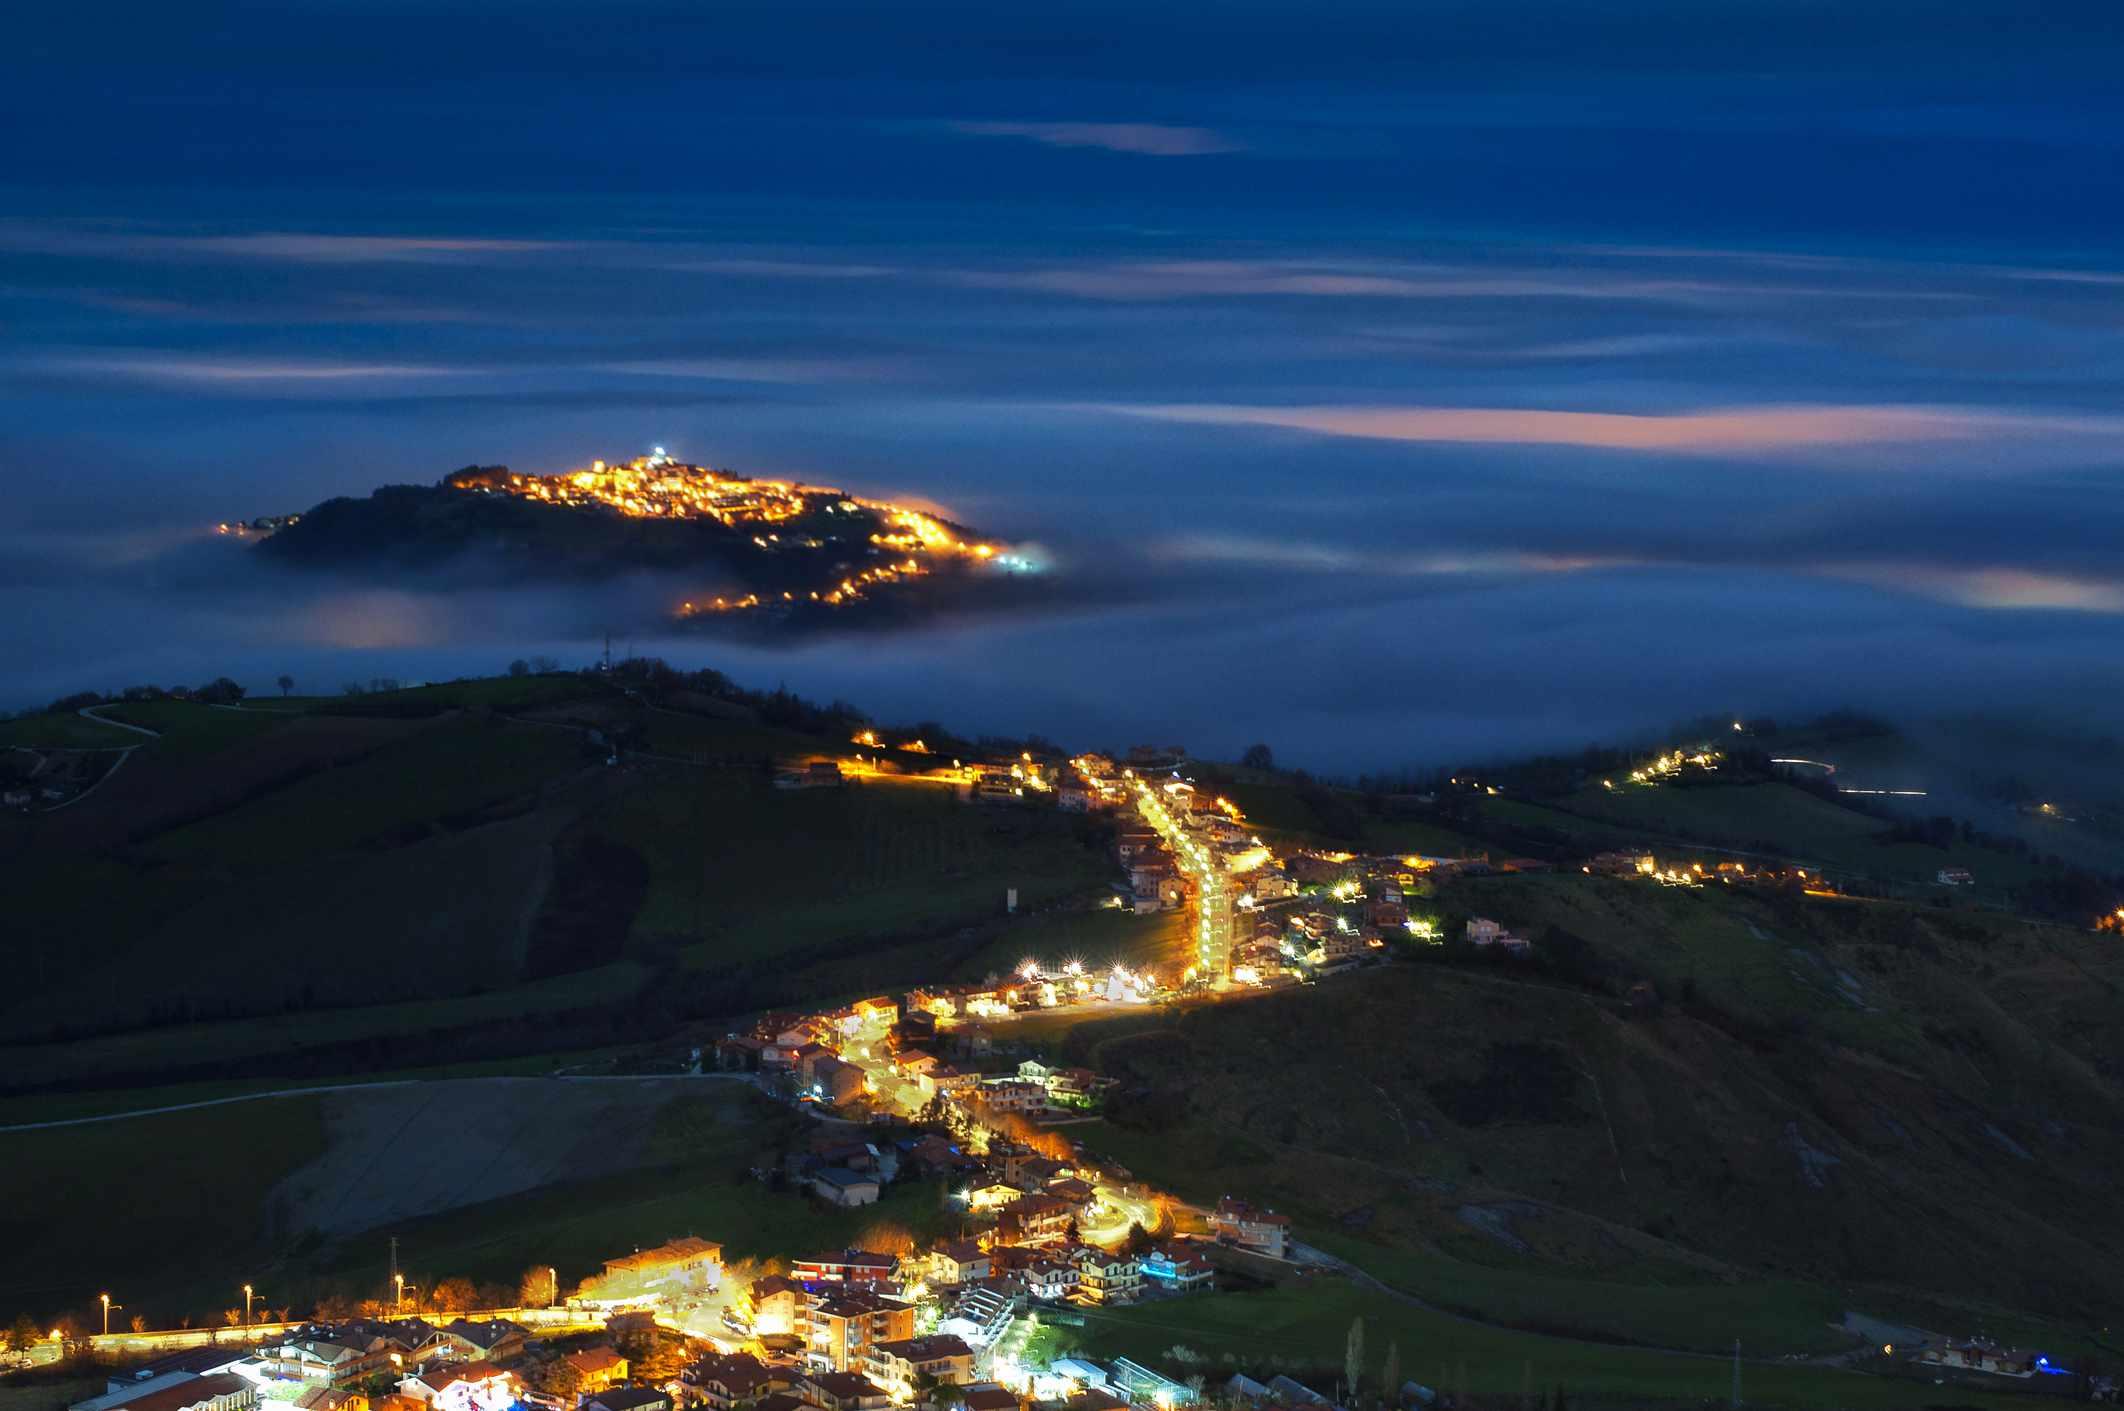 Night panorama from Monte Titano, San Marino